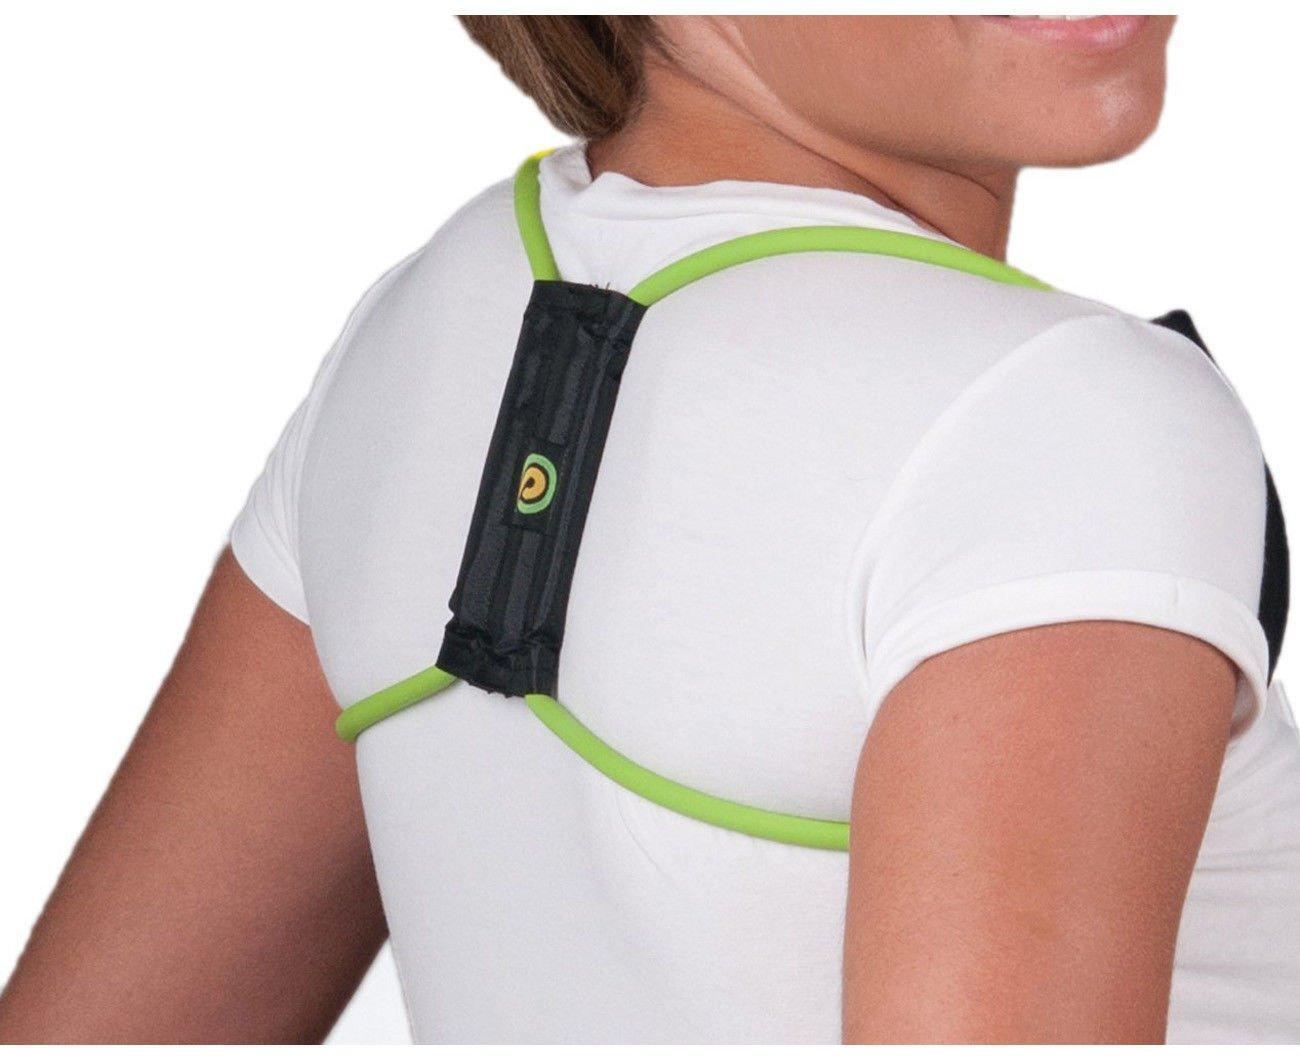 PostureMedic Original Posture Corrector Brace XSmall Small Medium Large XLarge PLUS